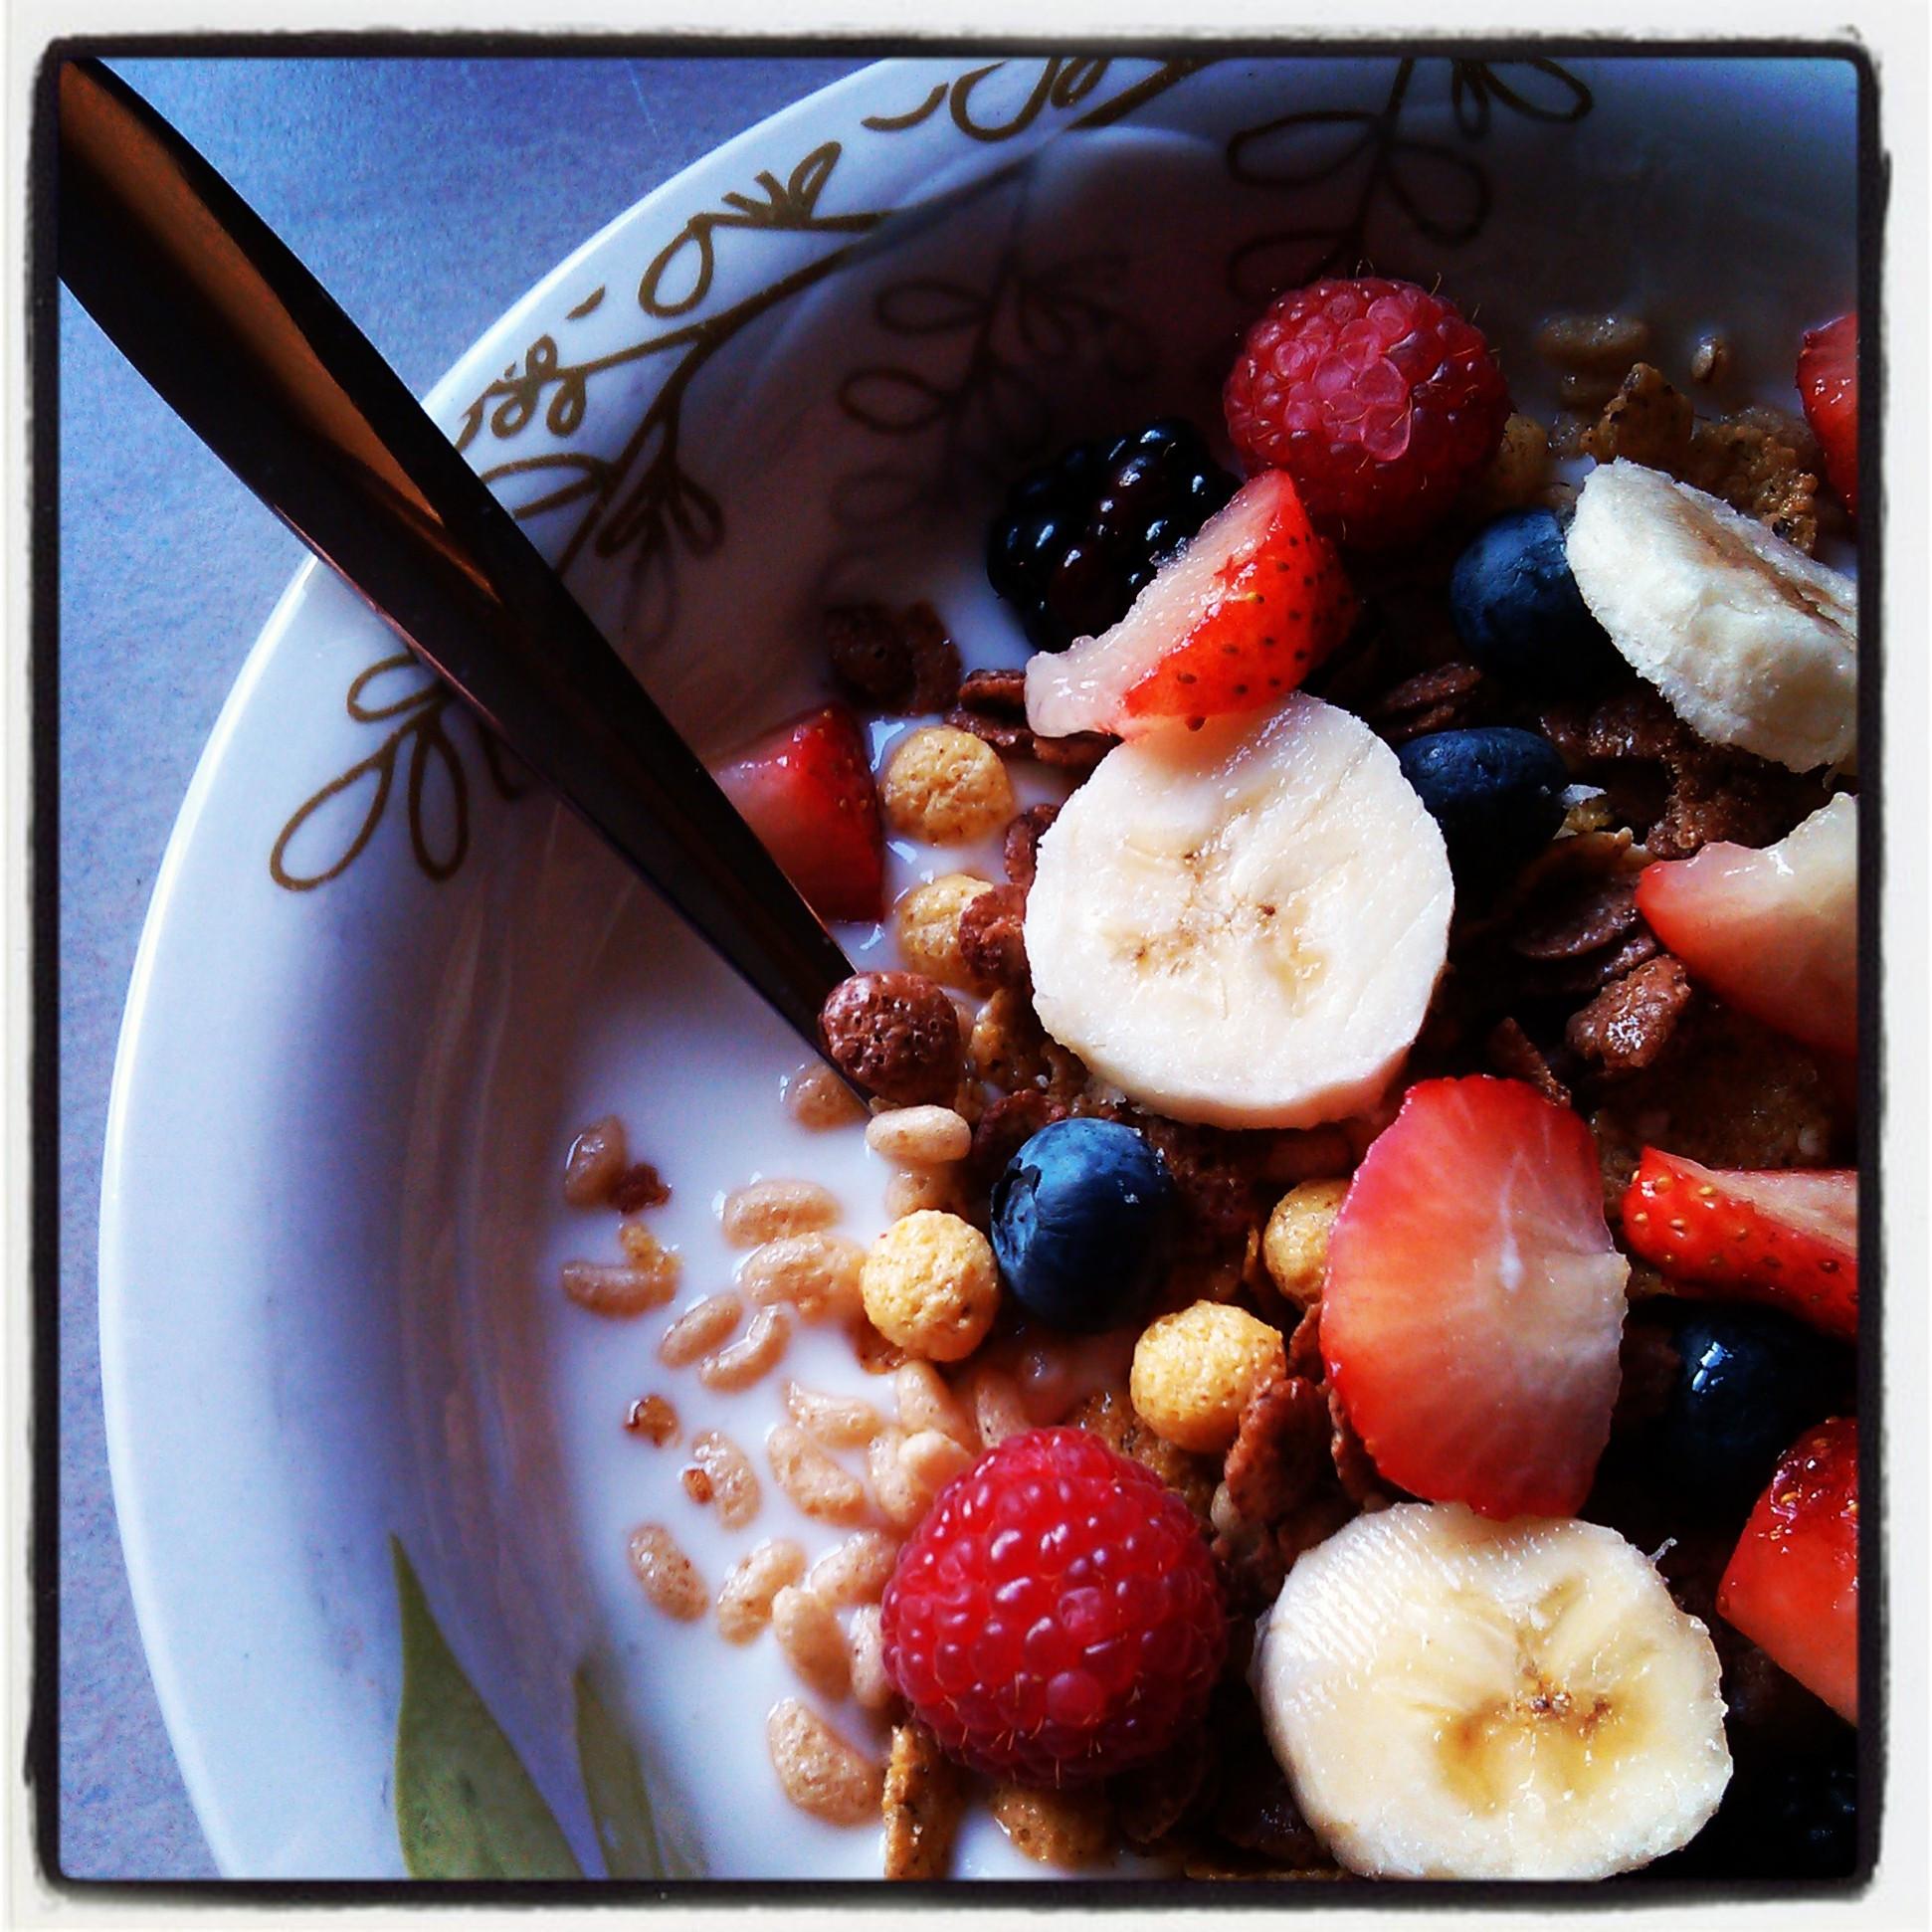 Healthy Fruit Breakfast  Healthy Fruit and Kefir Breakfast A Dish N Thyme